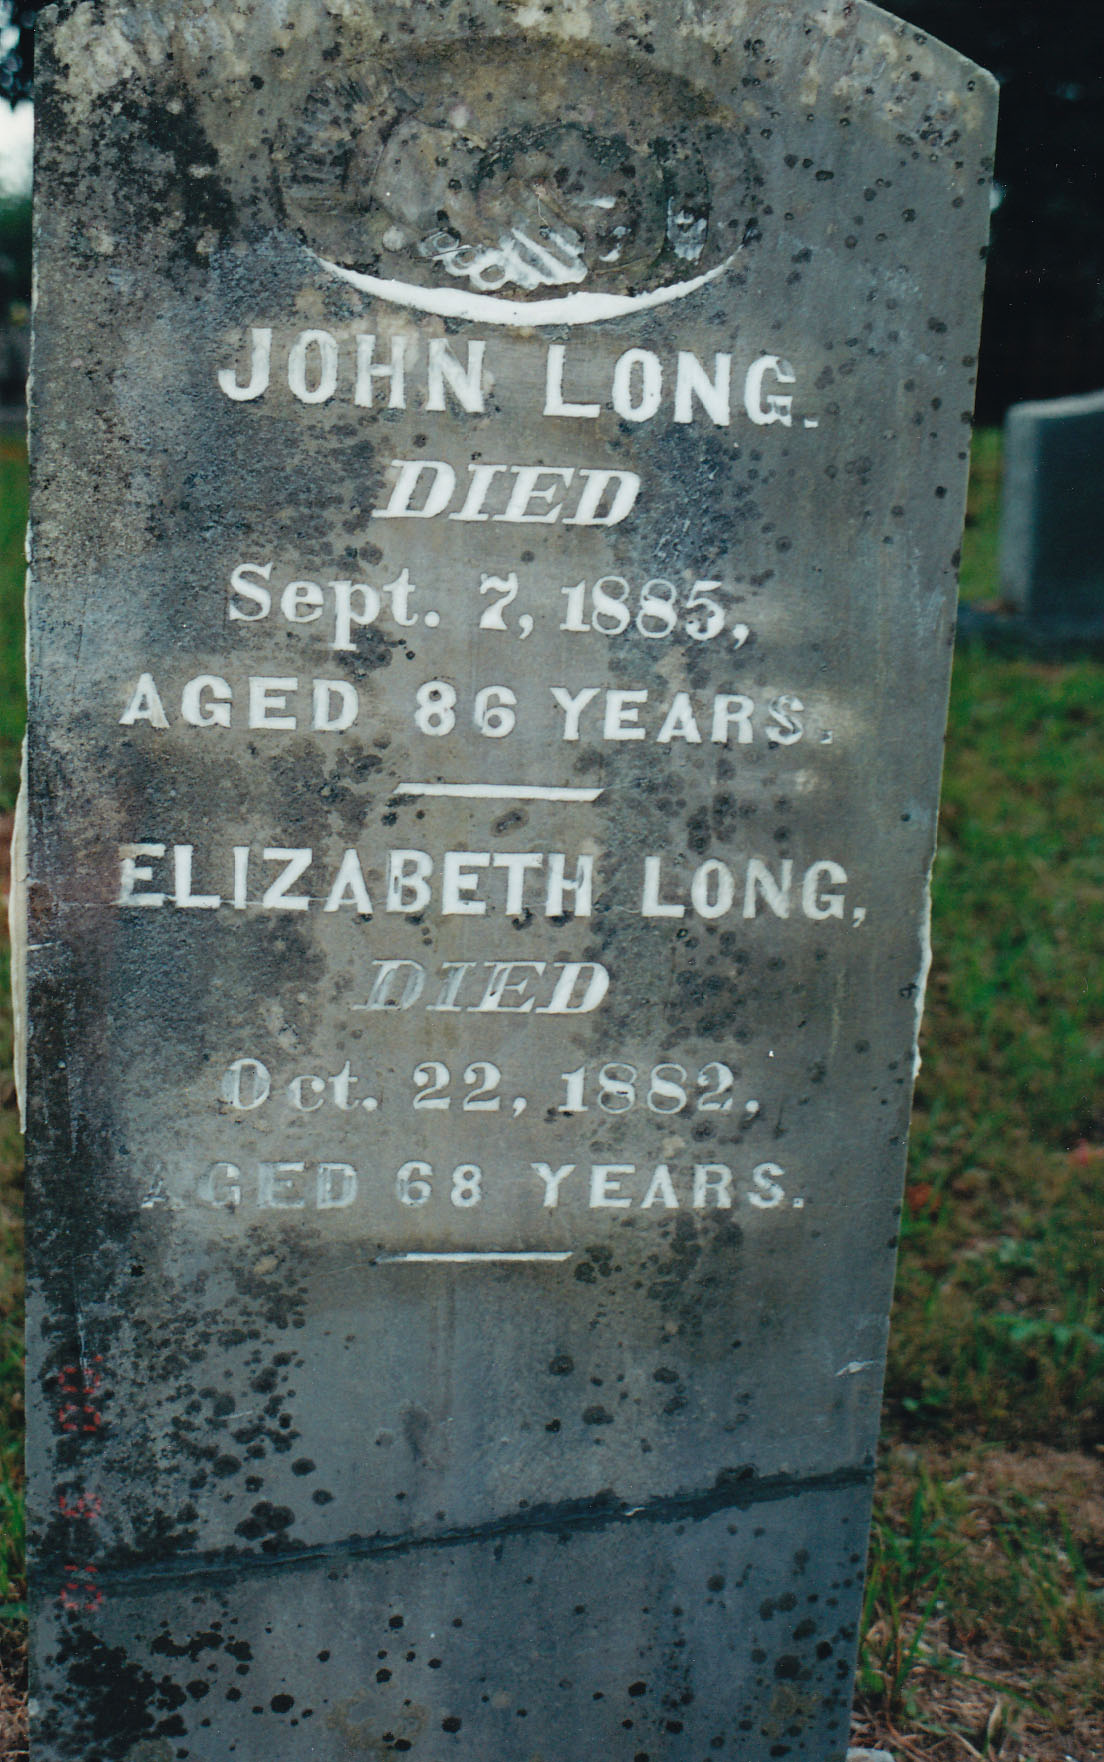 John Long, II